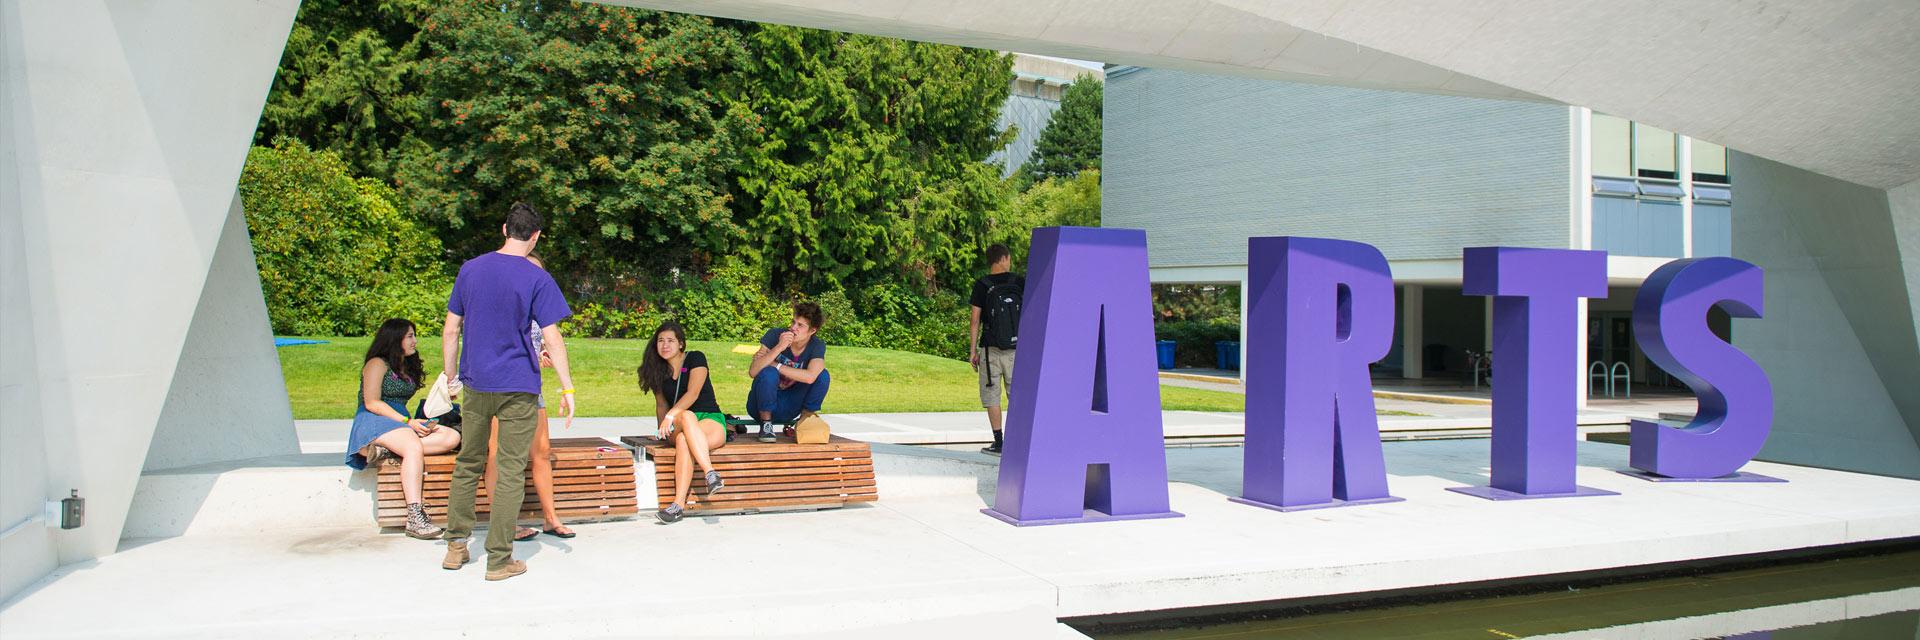 students sitting in Buchanan courtyard